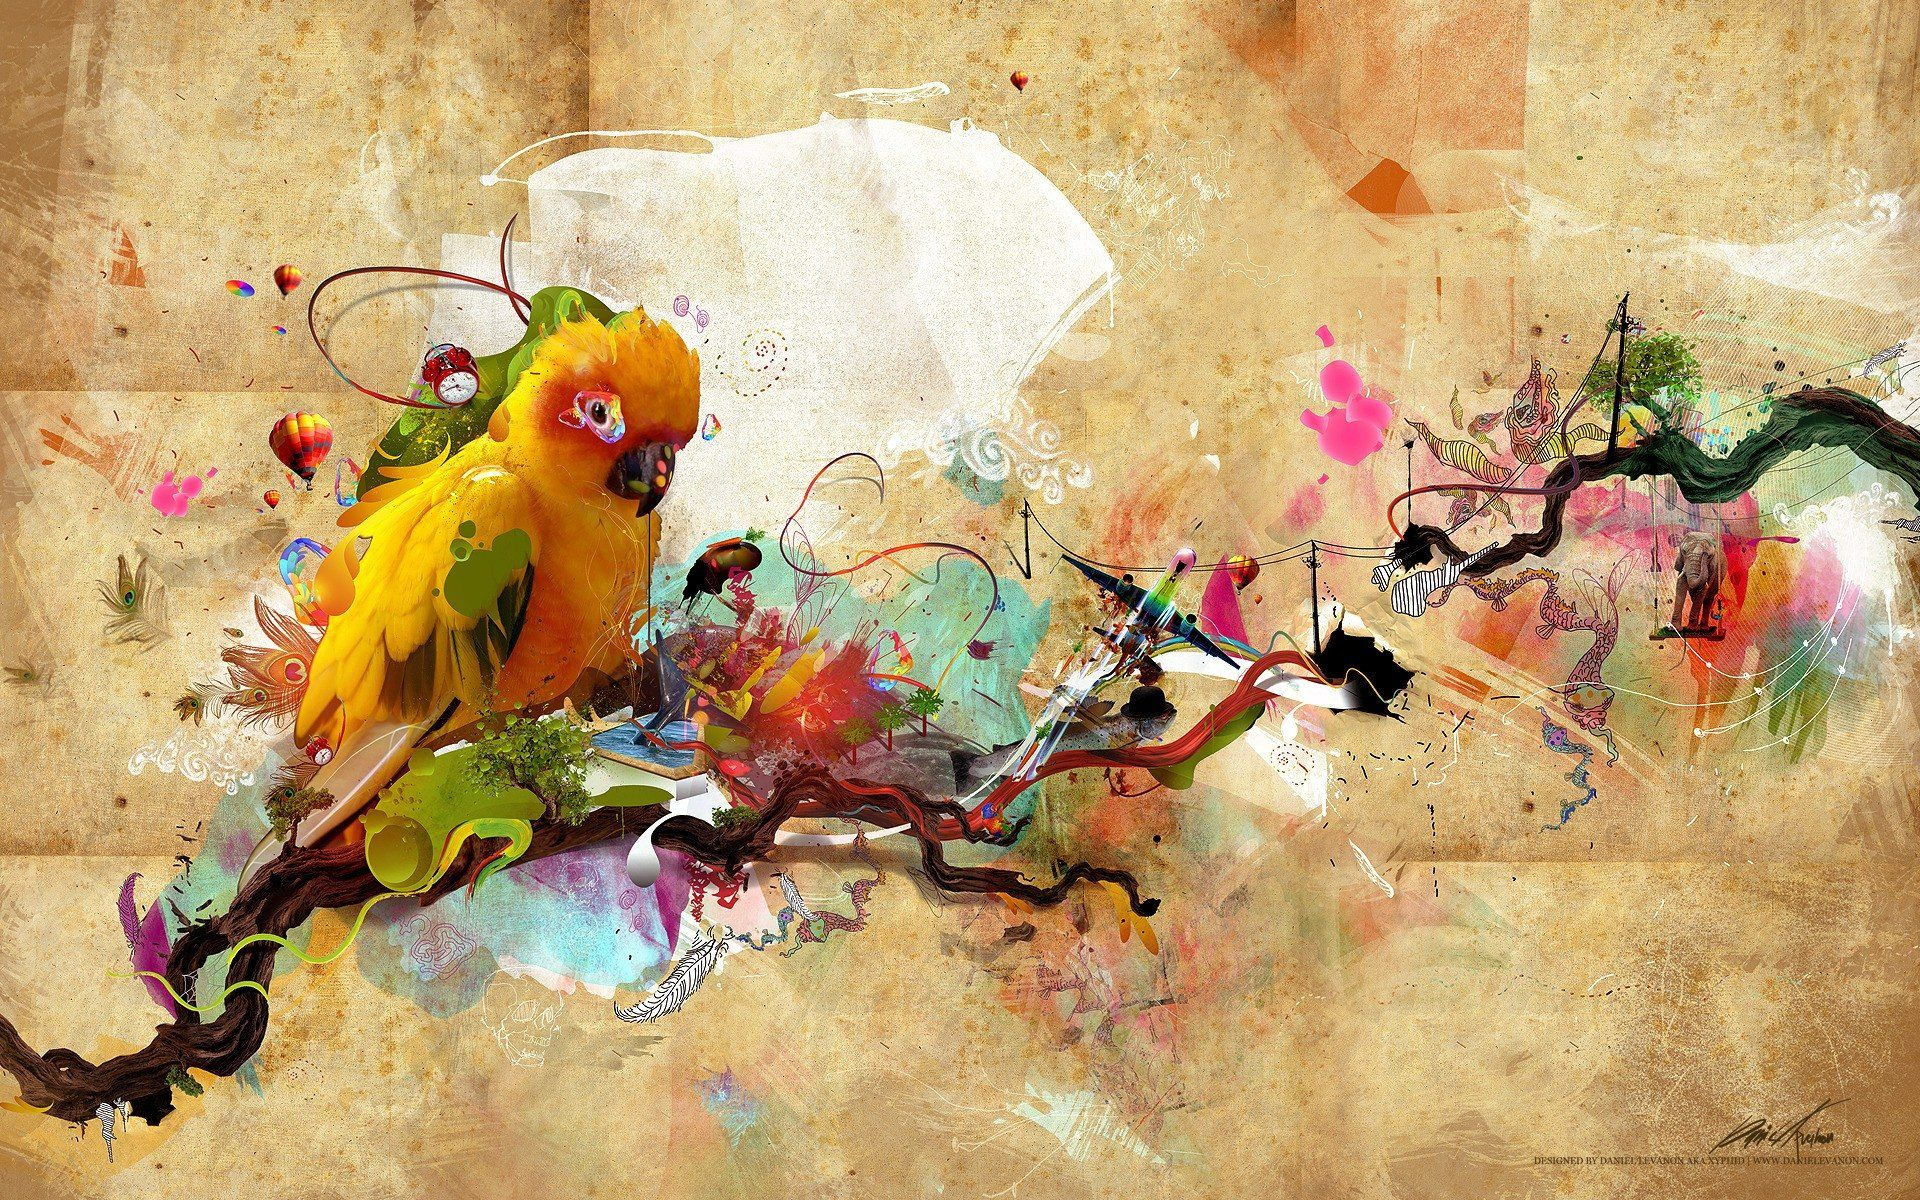 Artistic wallpaper | 1920x1200 | #47017 | picks | Pinterest ...